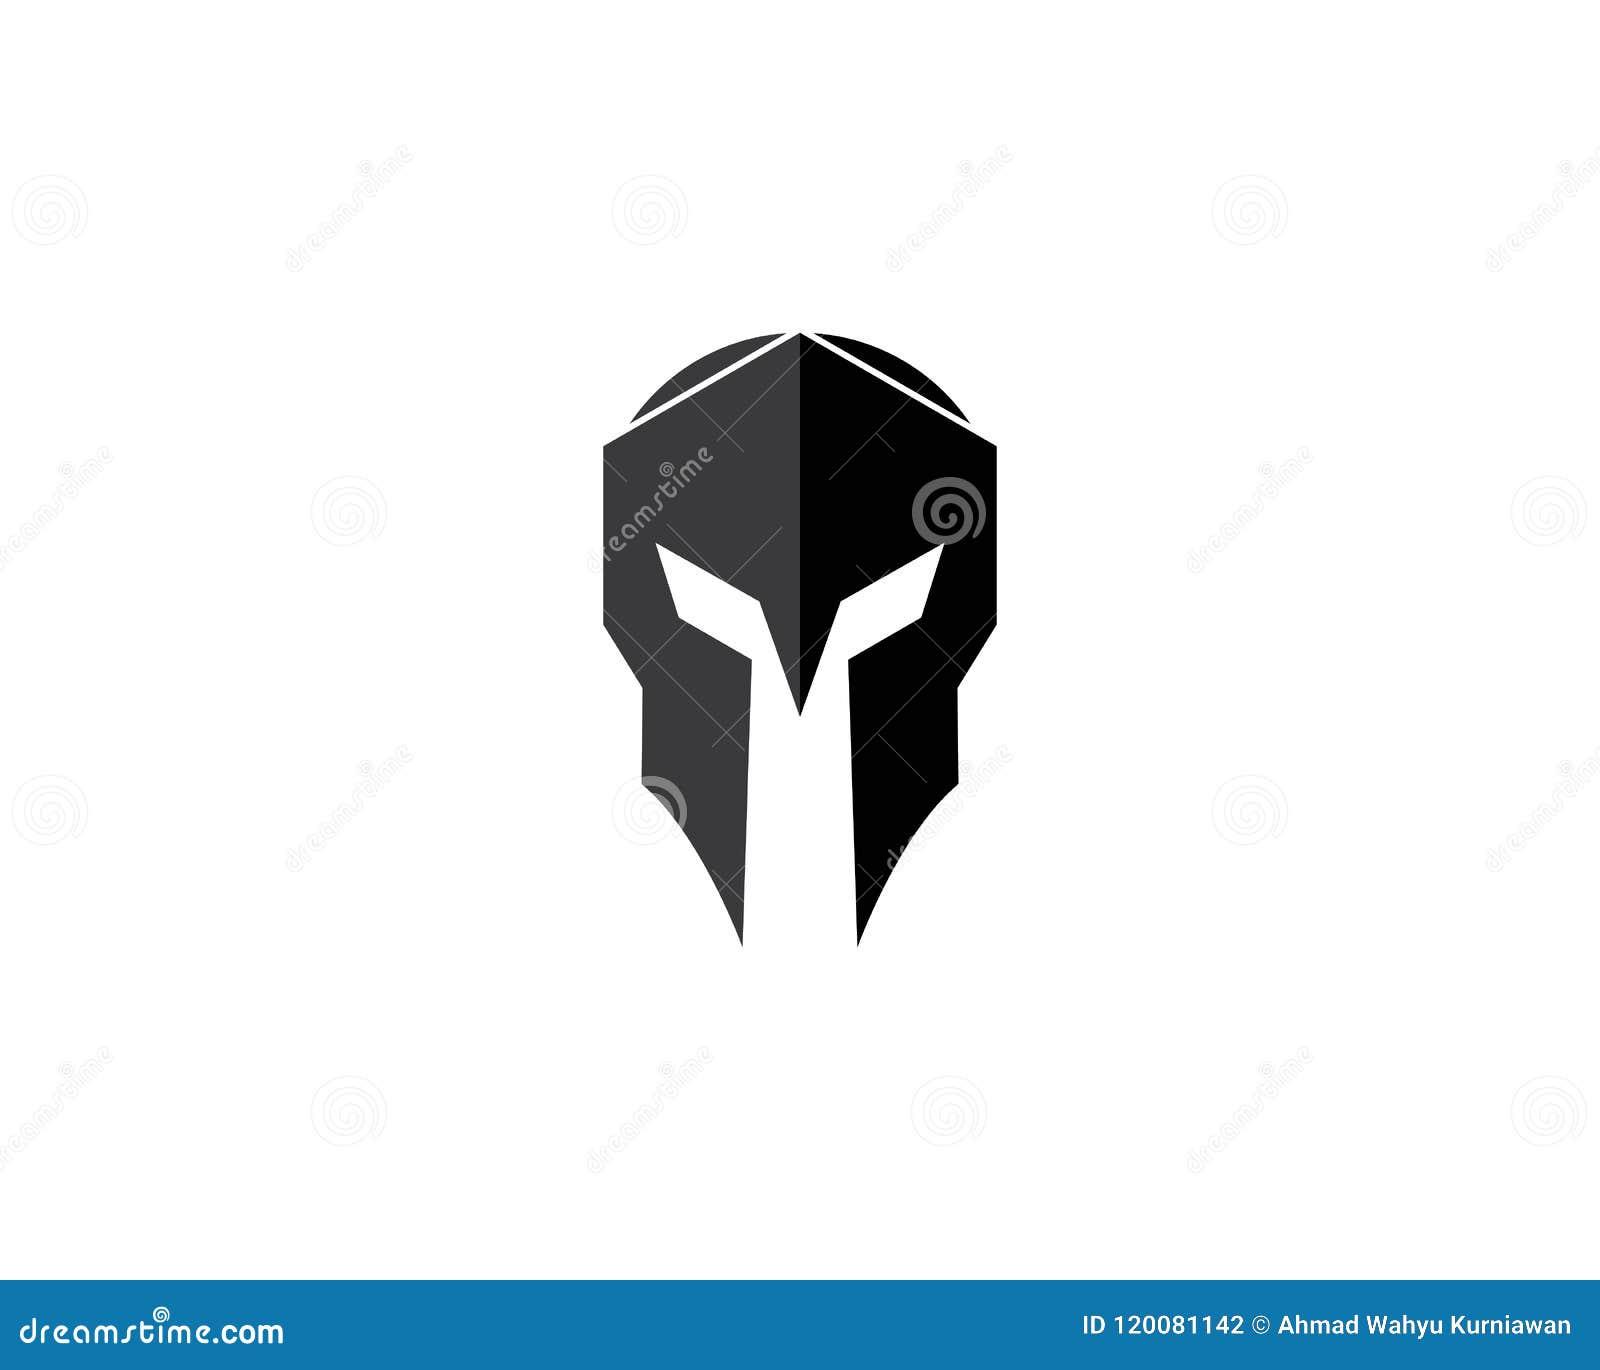 Spartan Helmet Stock Vector Illustration Of Protection 120081142